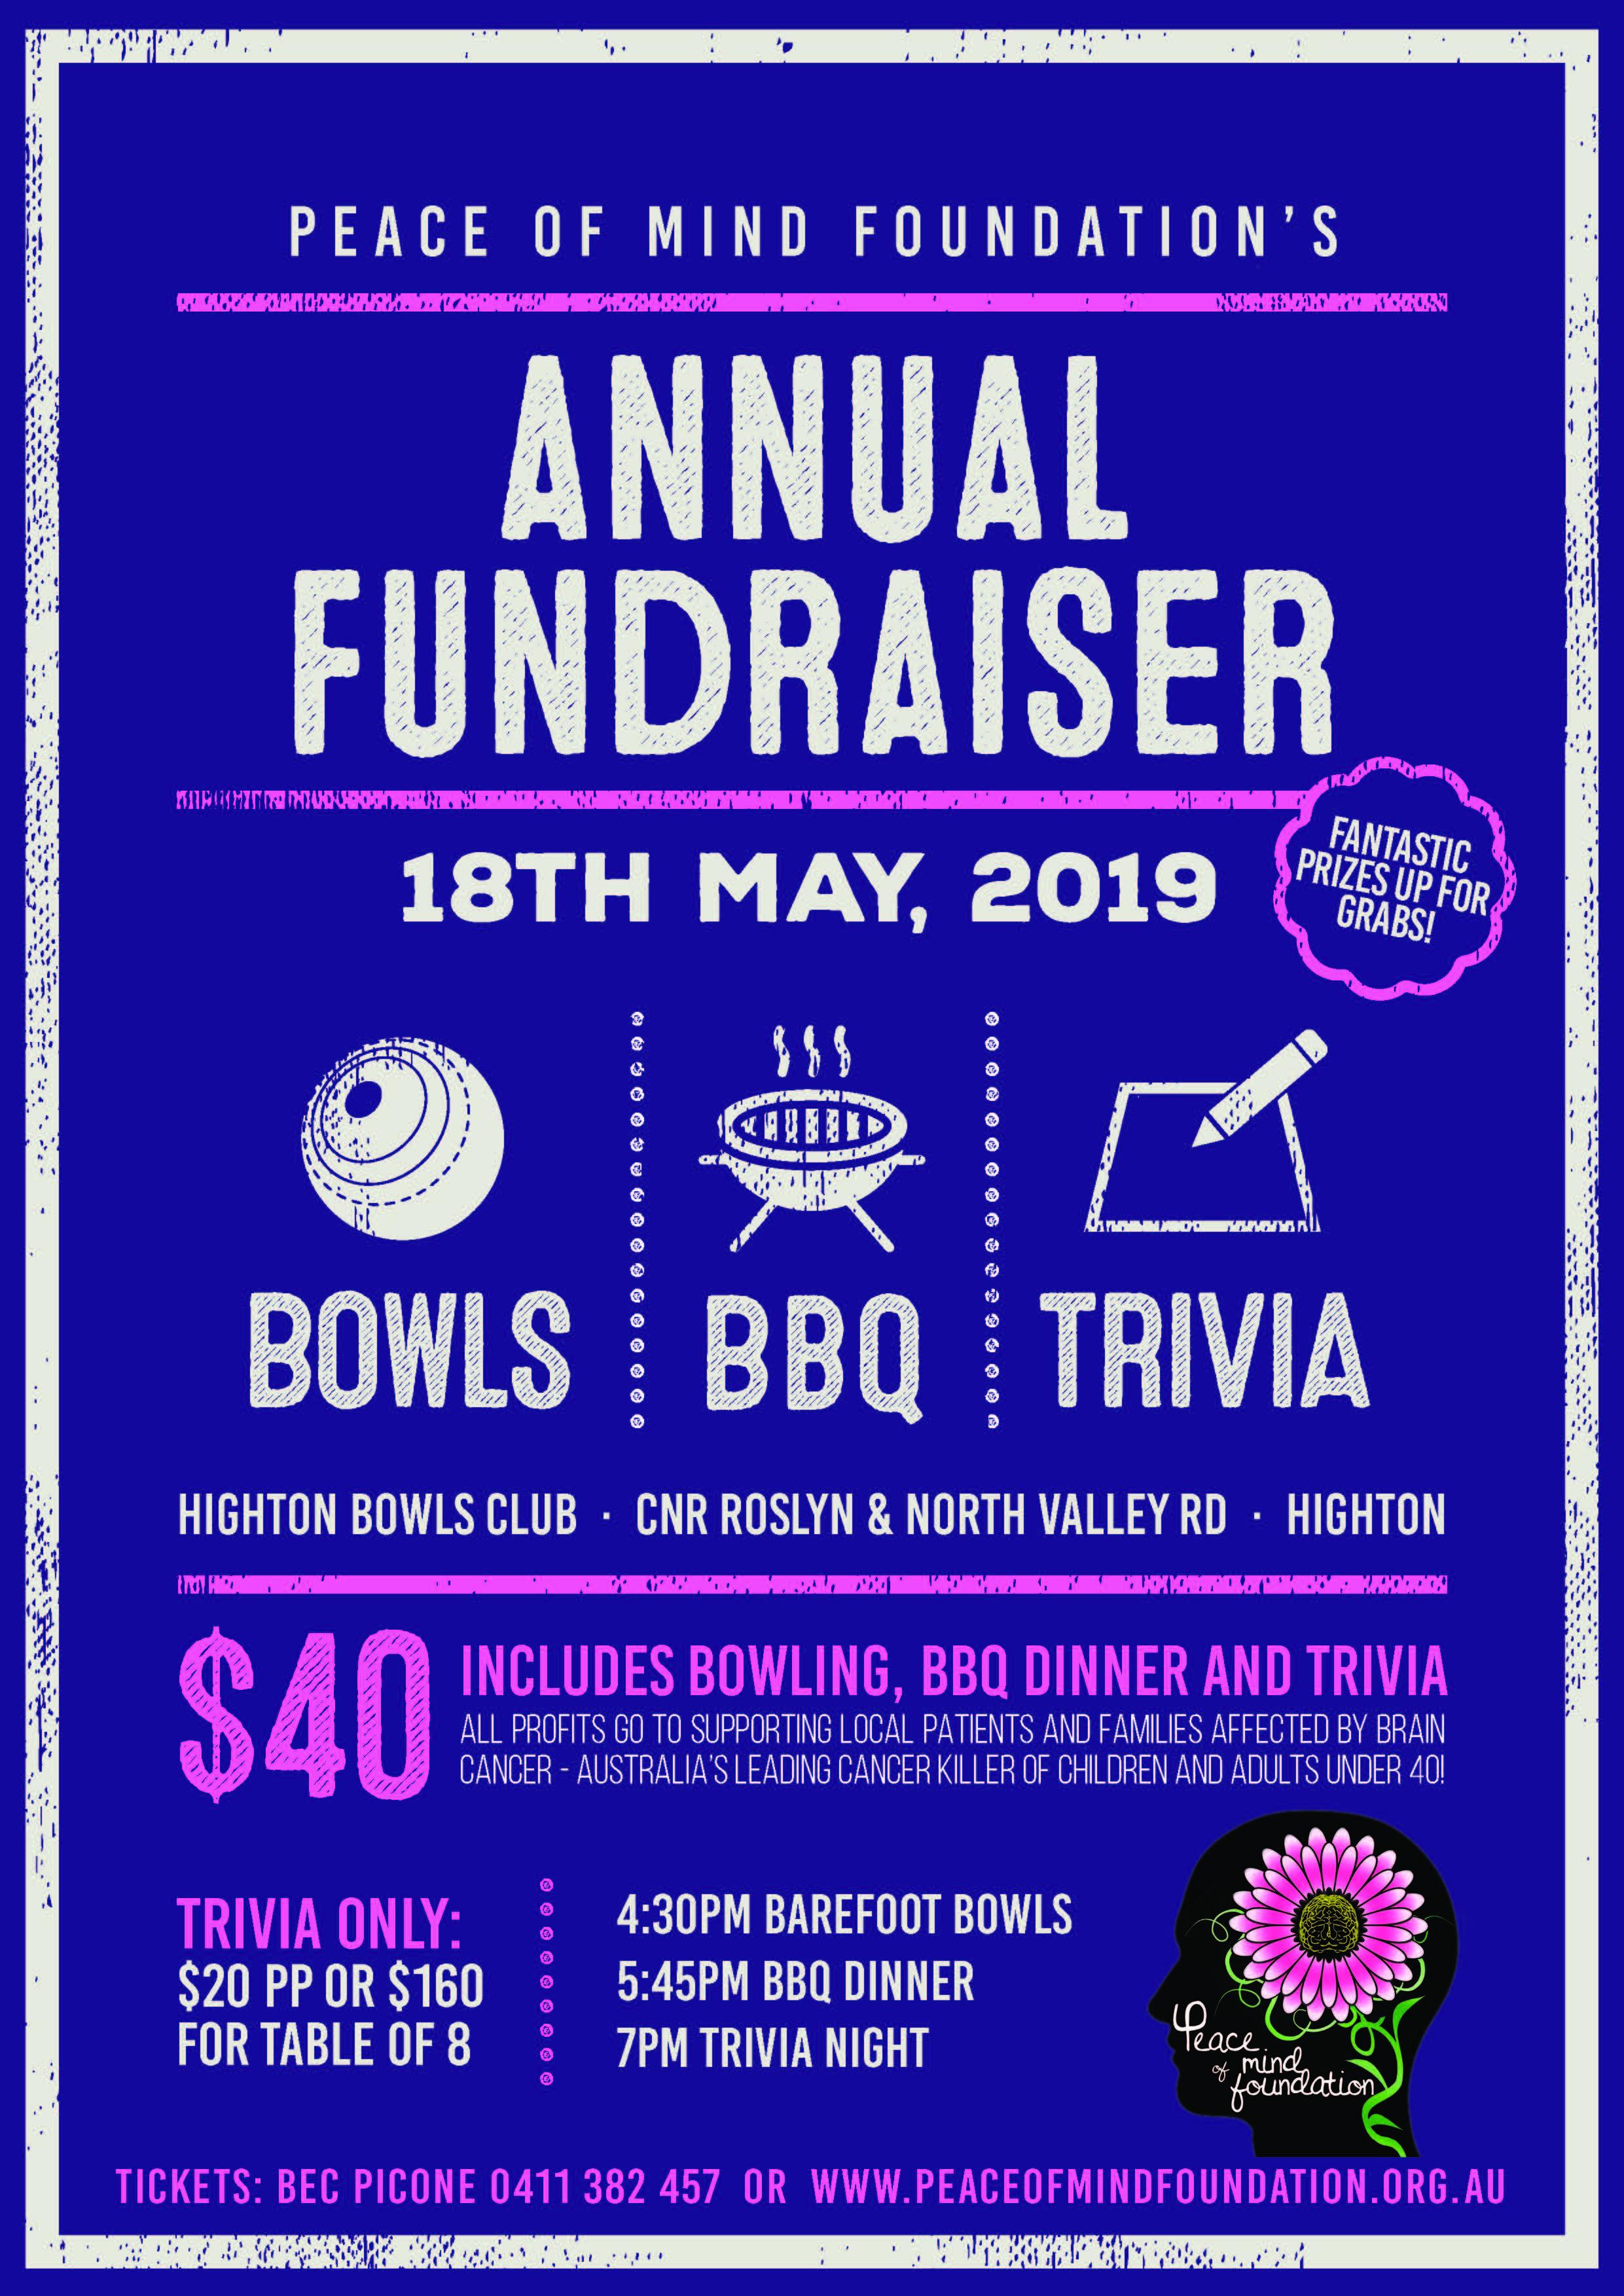 Bowls BBQ and Trivia poster 2019 PDF.jpg